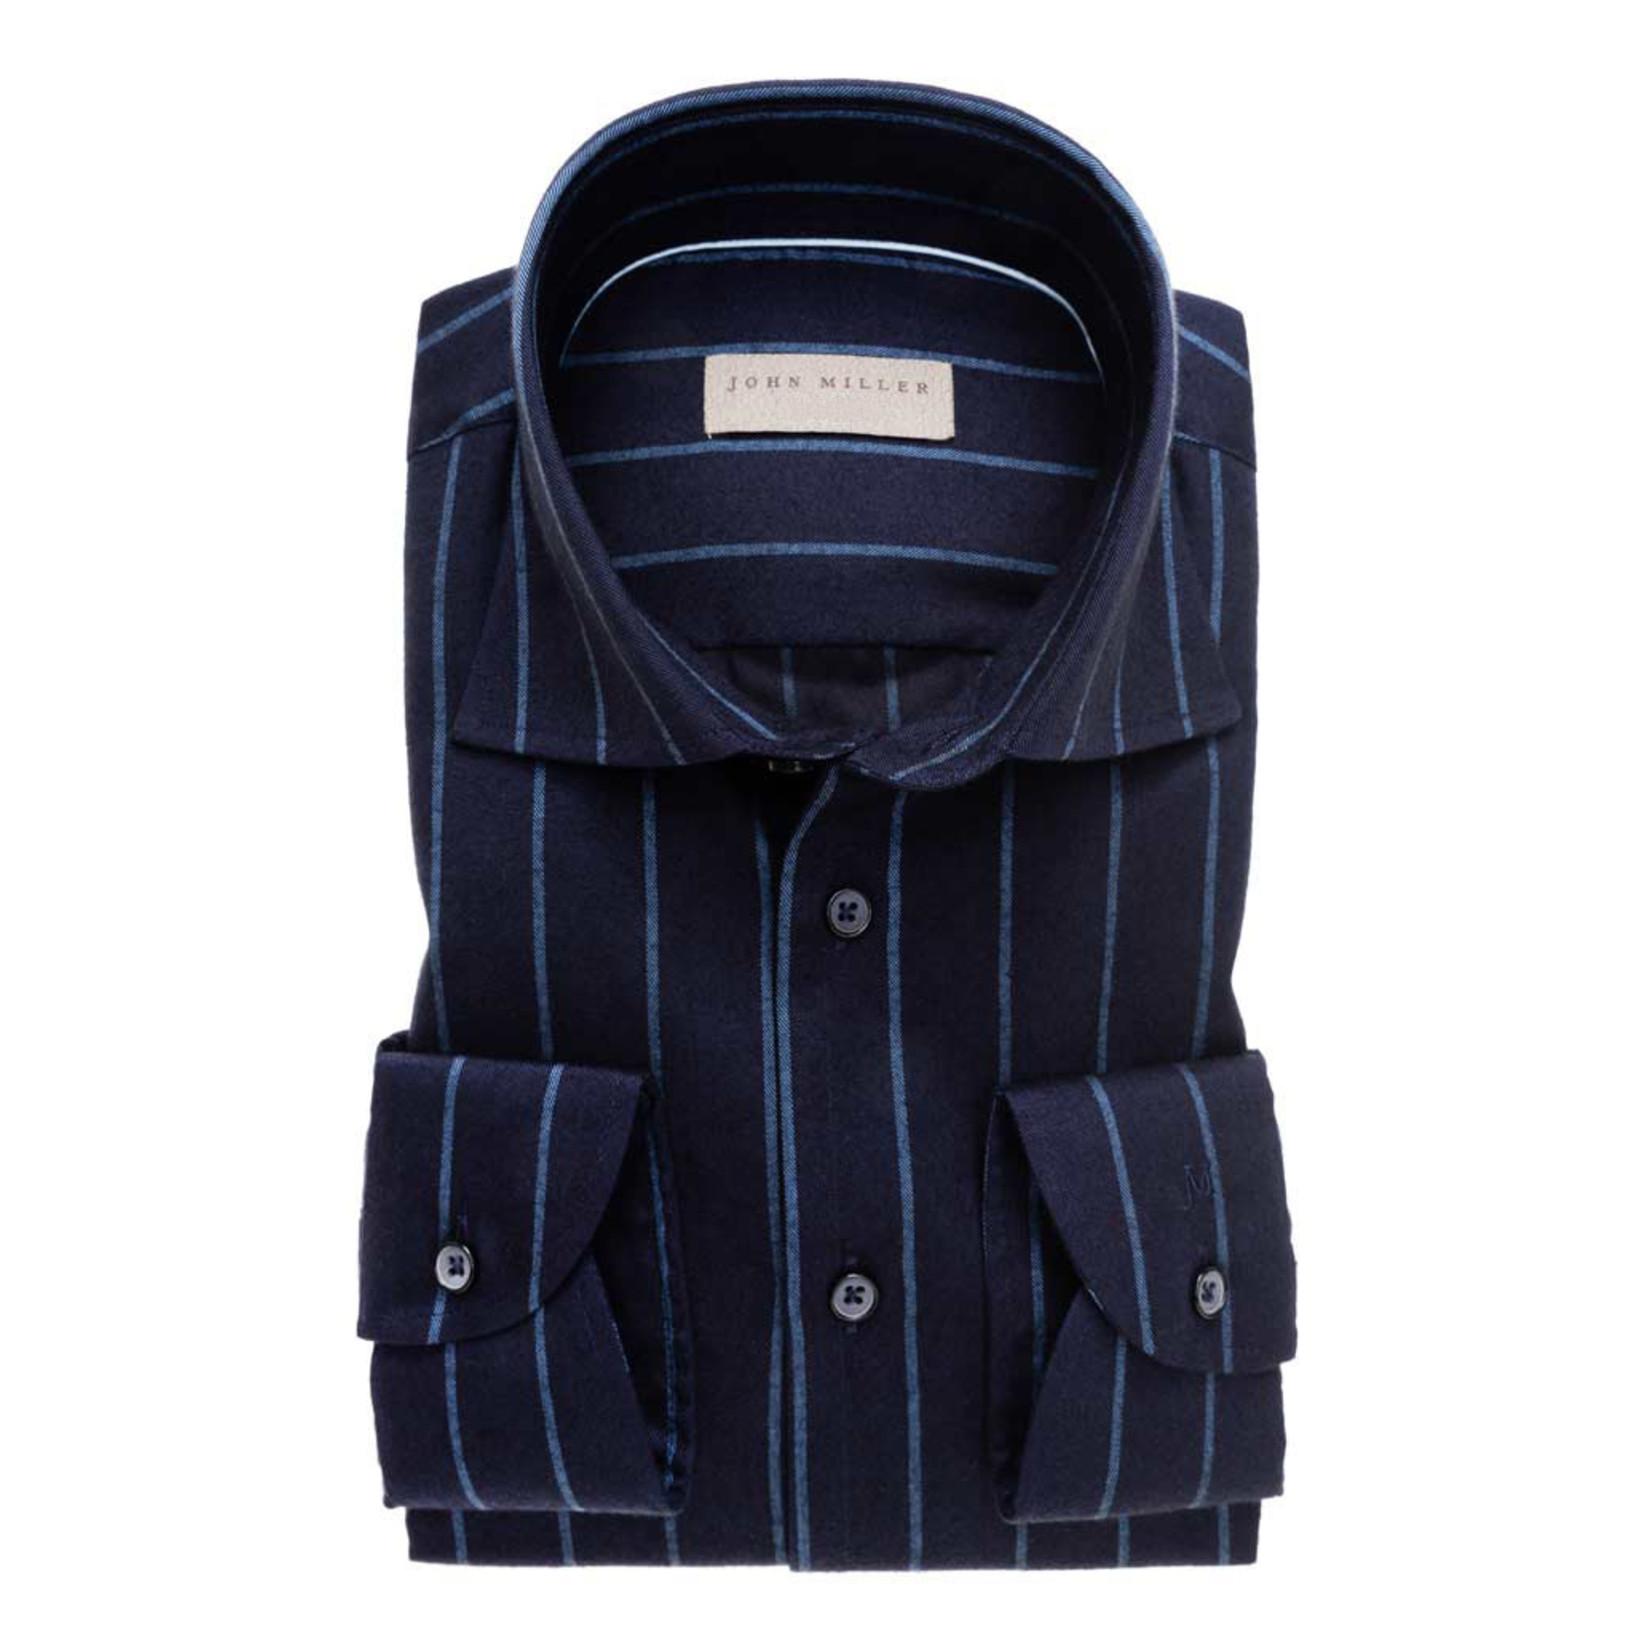 John Miller tailored fit overhemd marine streep met wide spread boord